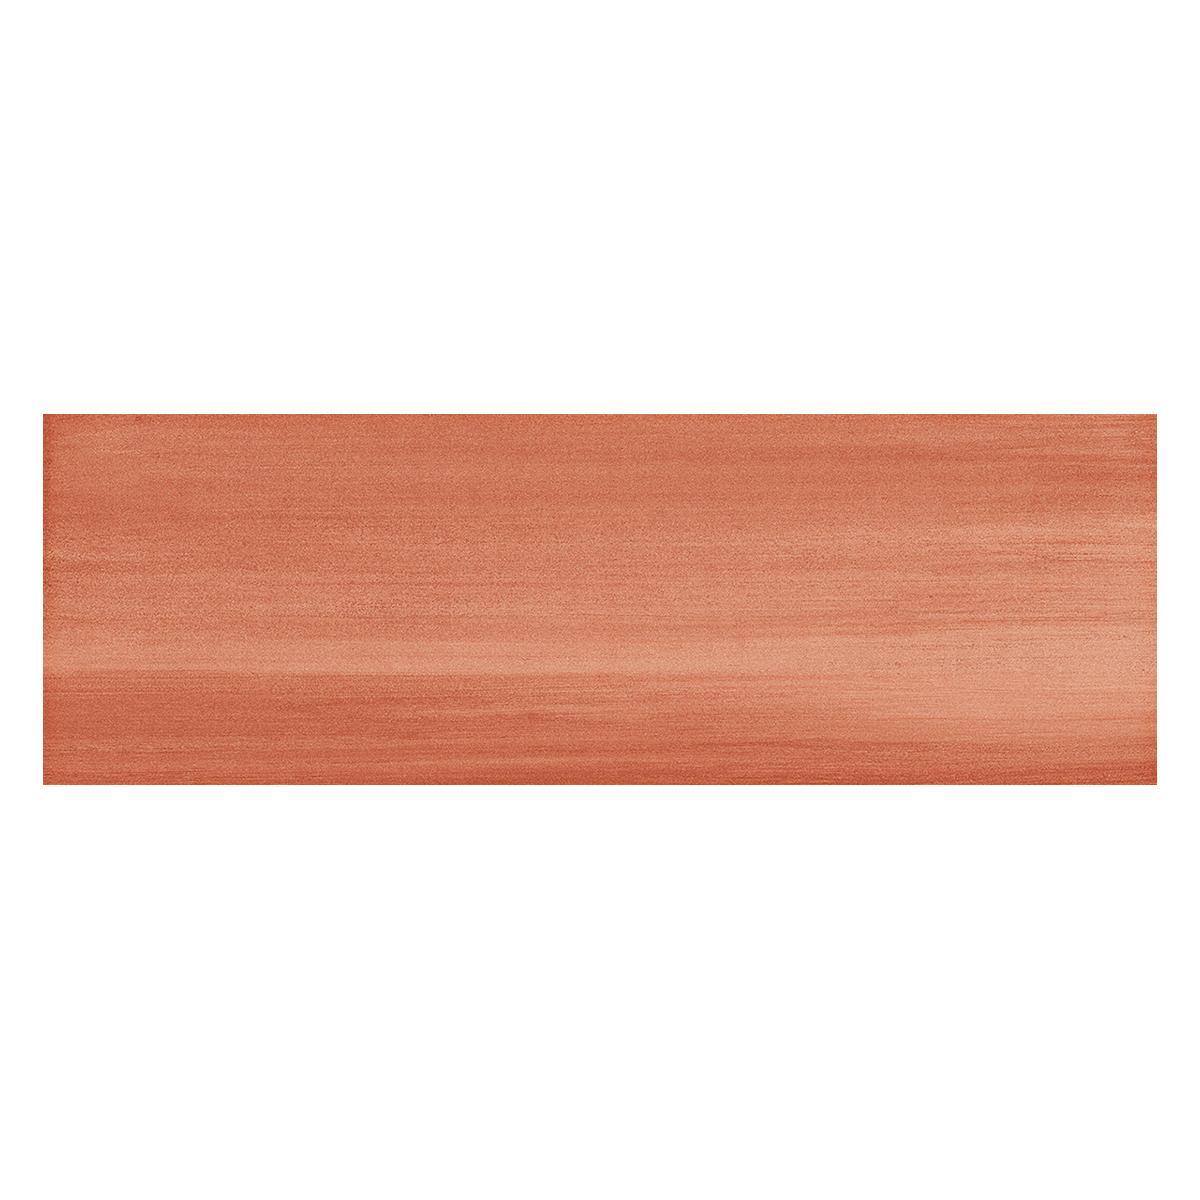 Mayólica Capitol Coral Brillante - 30X90 cm - 1.08 m2